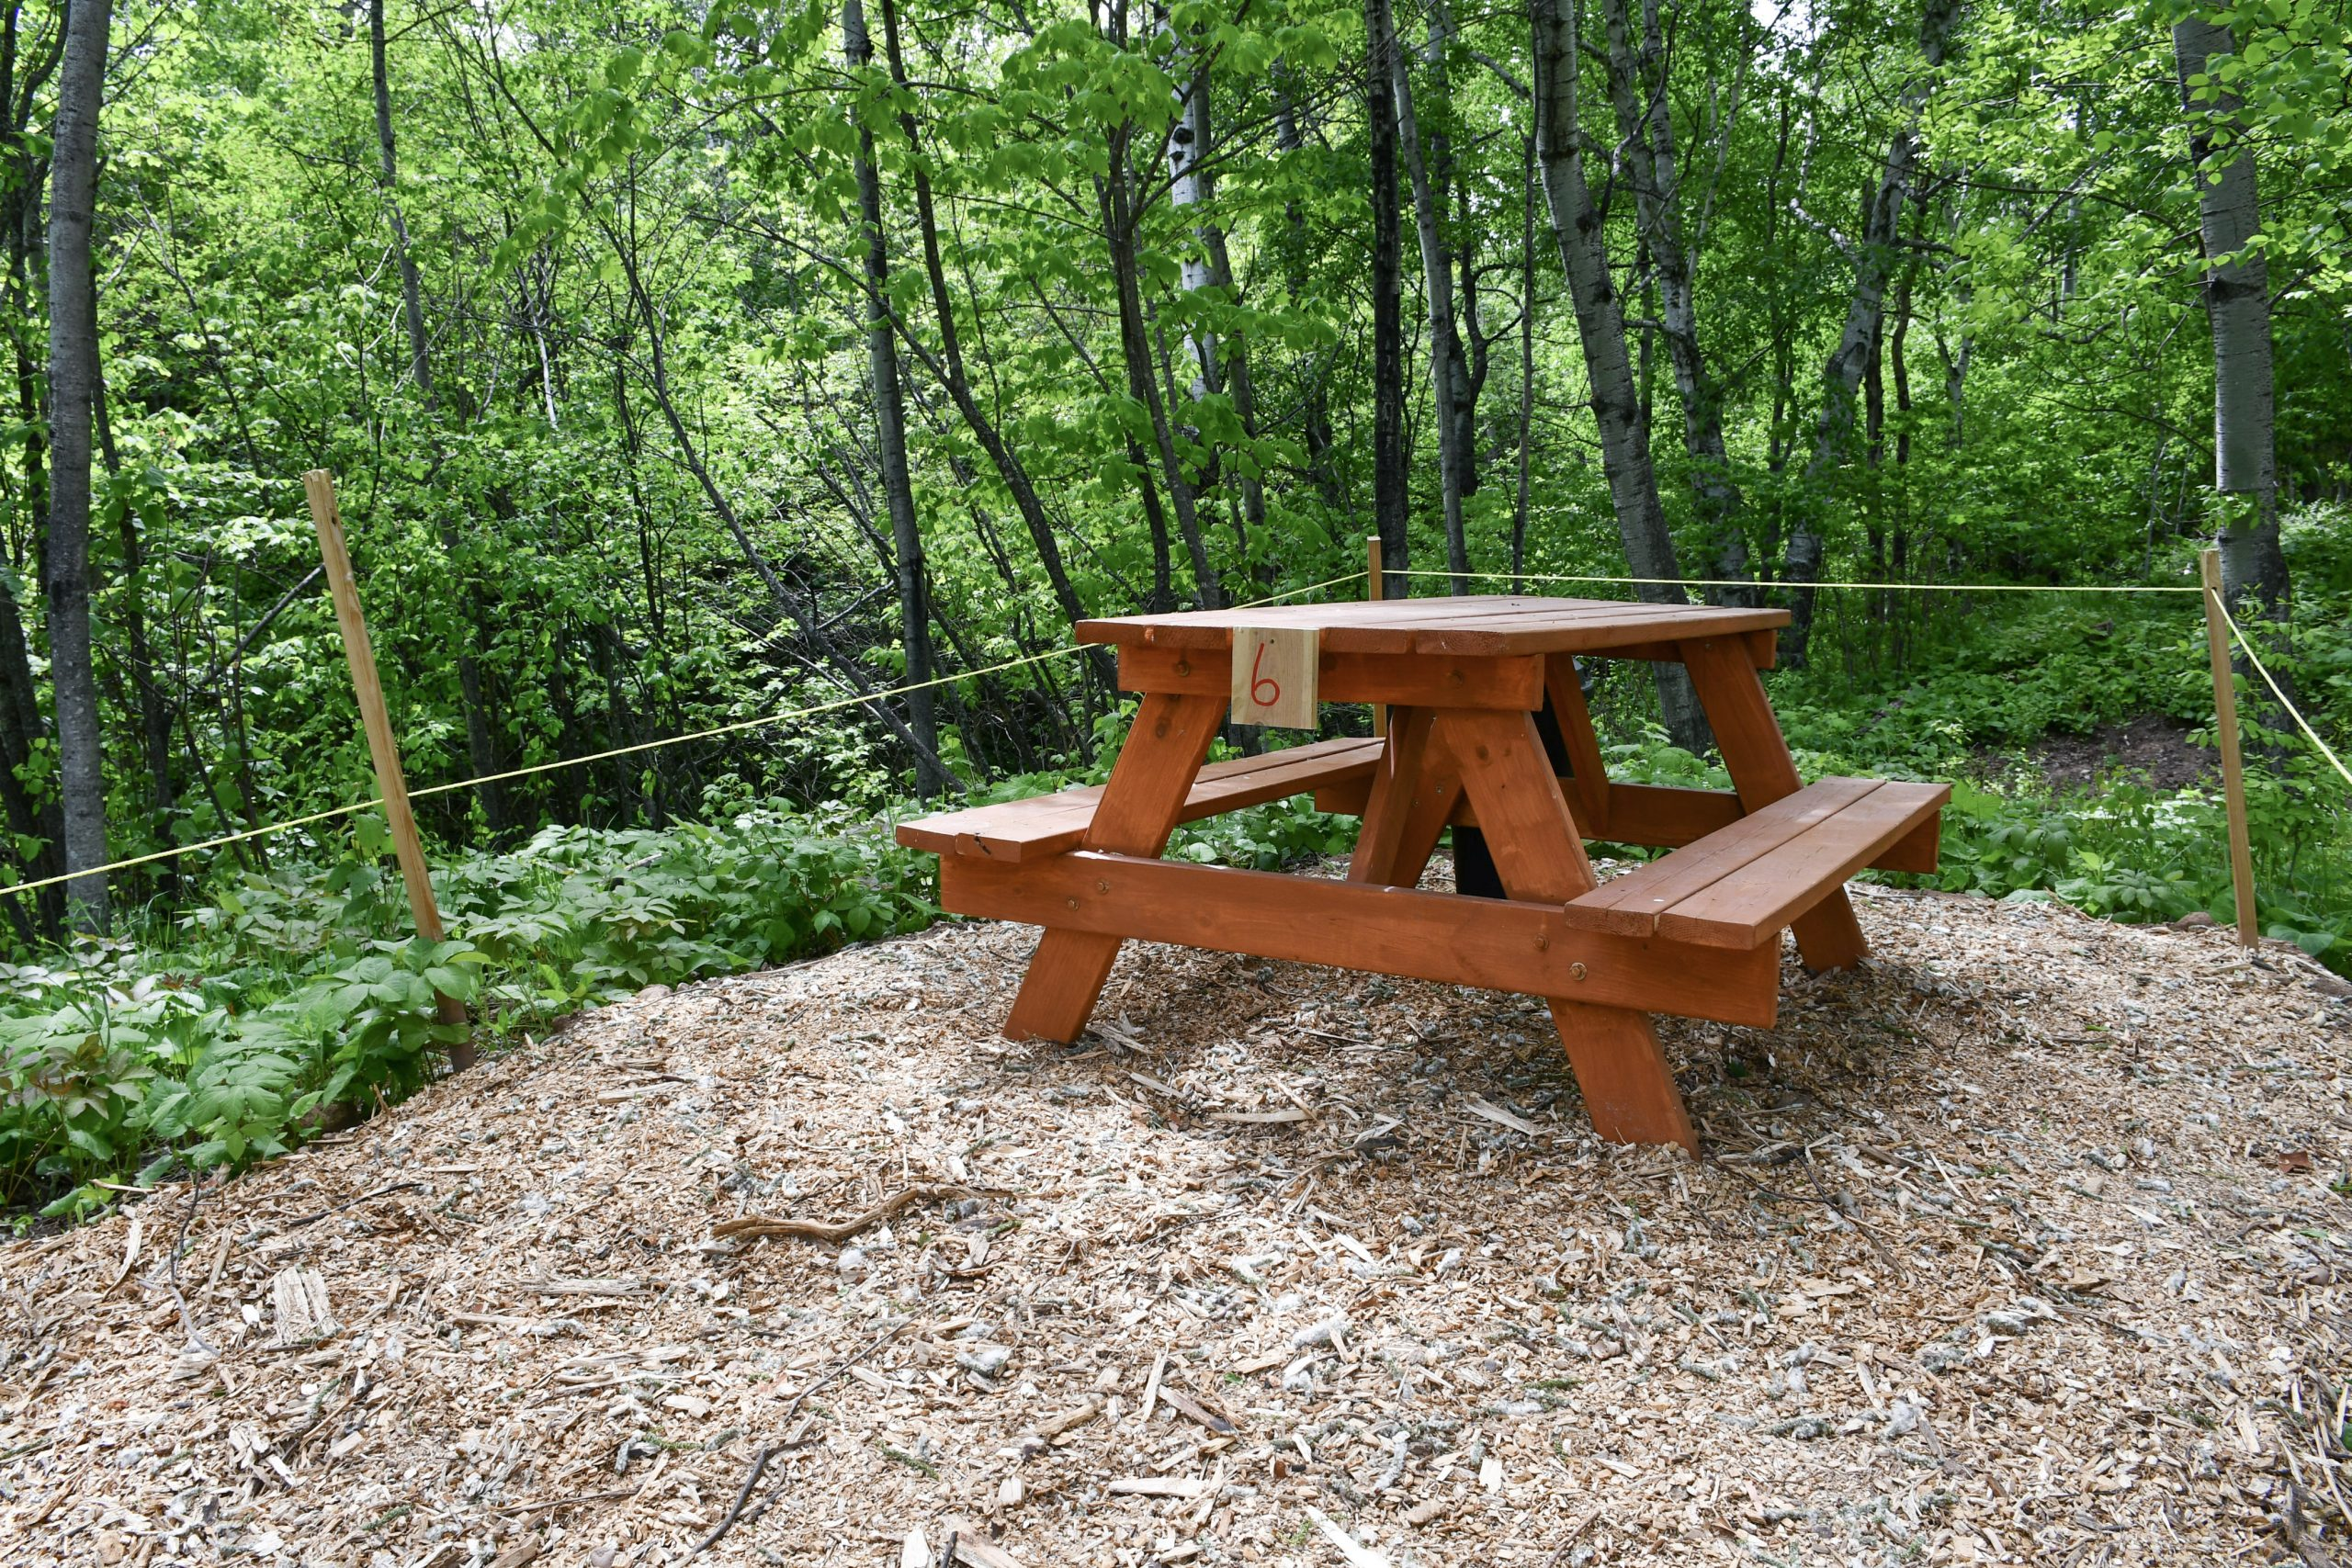 Picnic areas at the North Shore Adventure Park